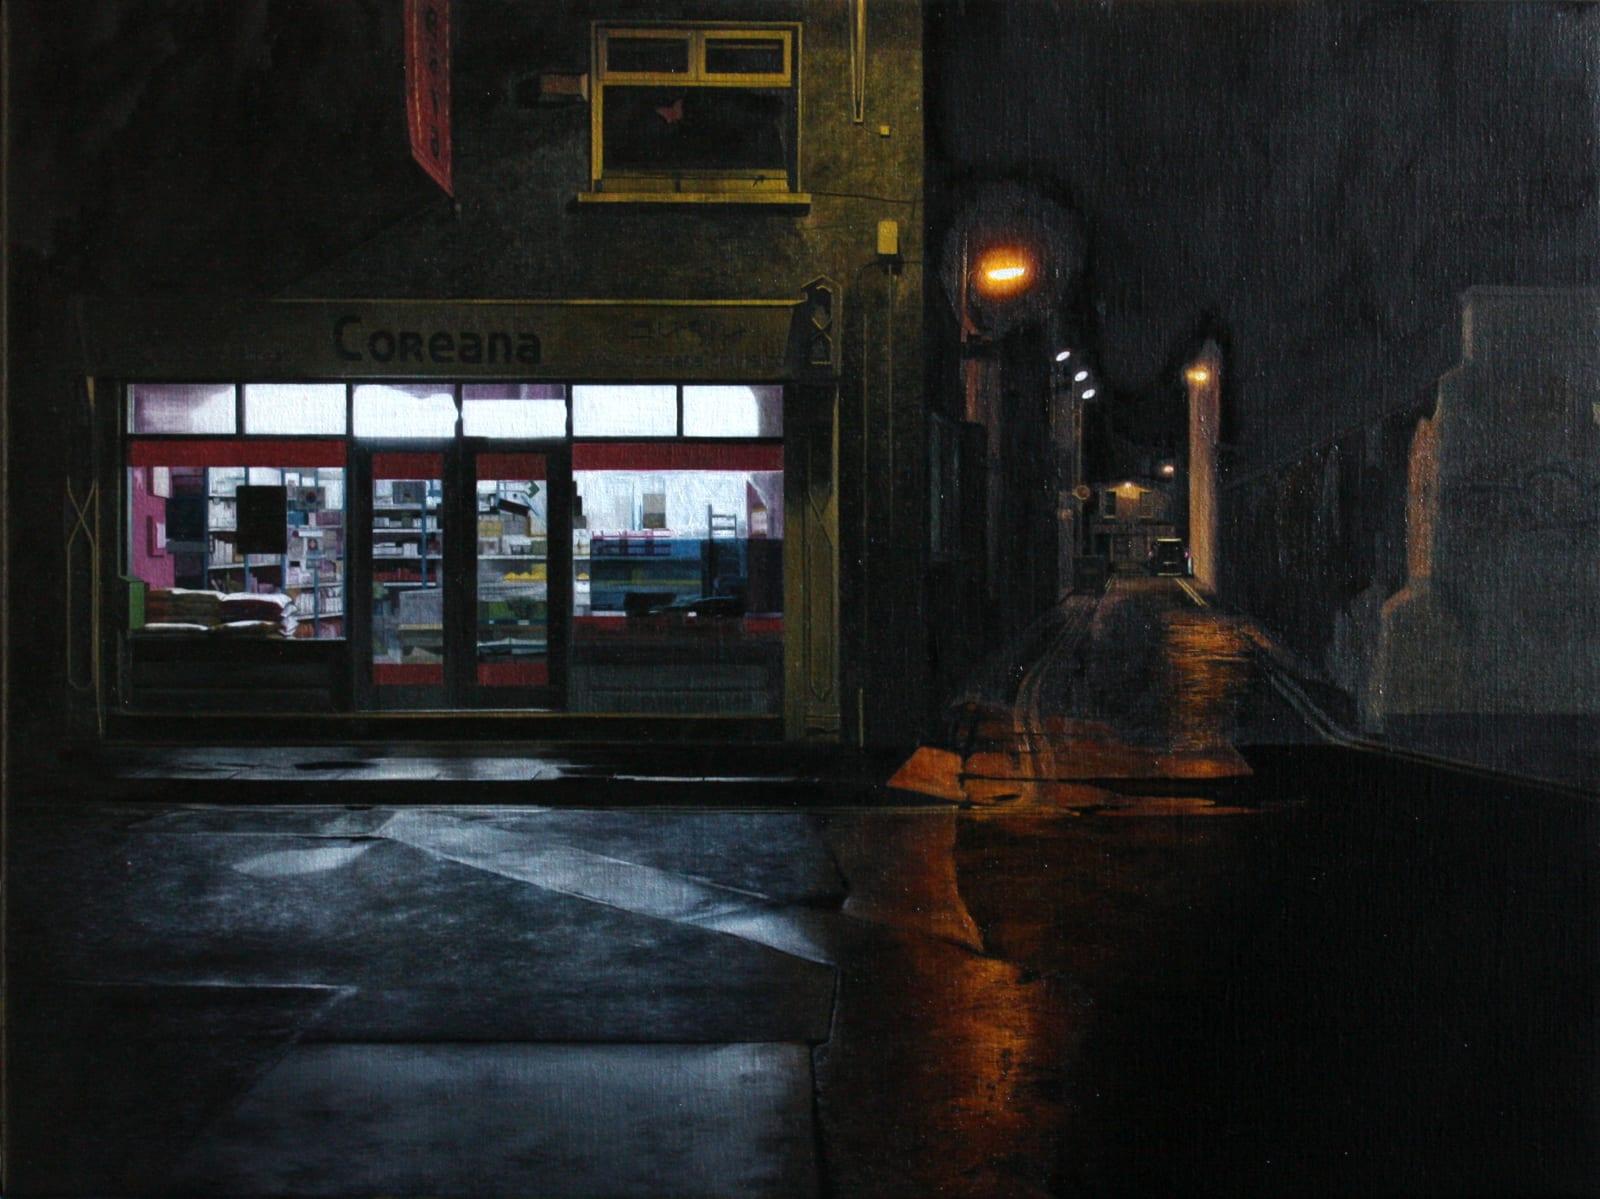 Francis Matthews  Coreana  Oil on linen  45 x 60 cm